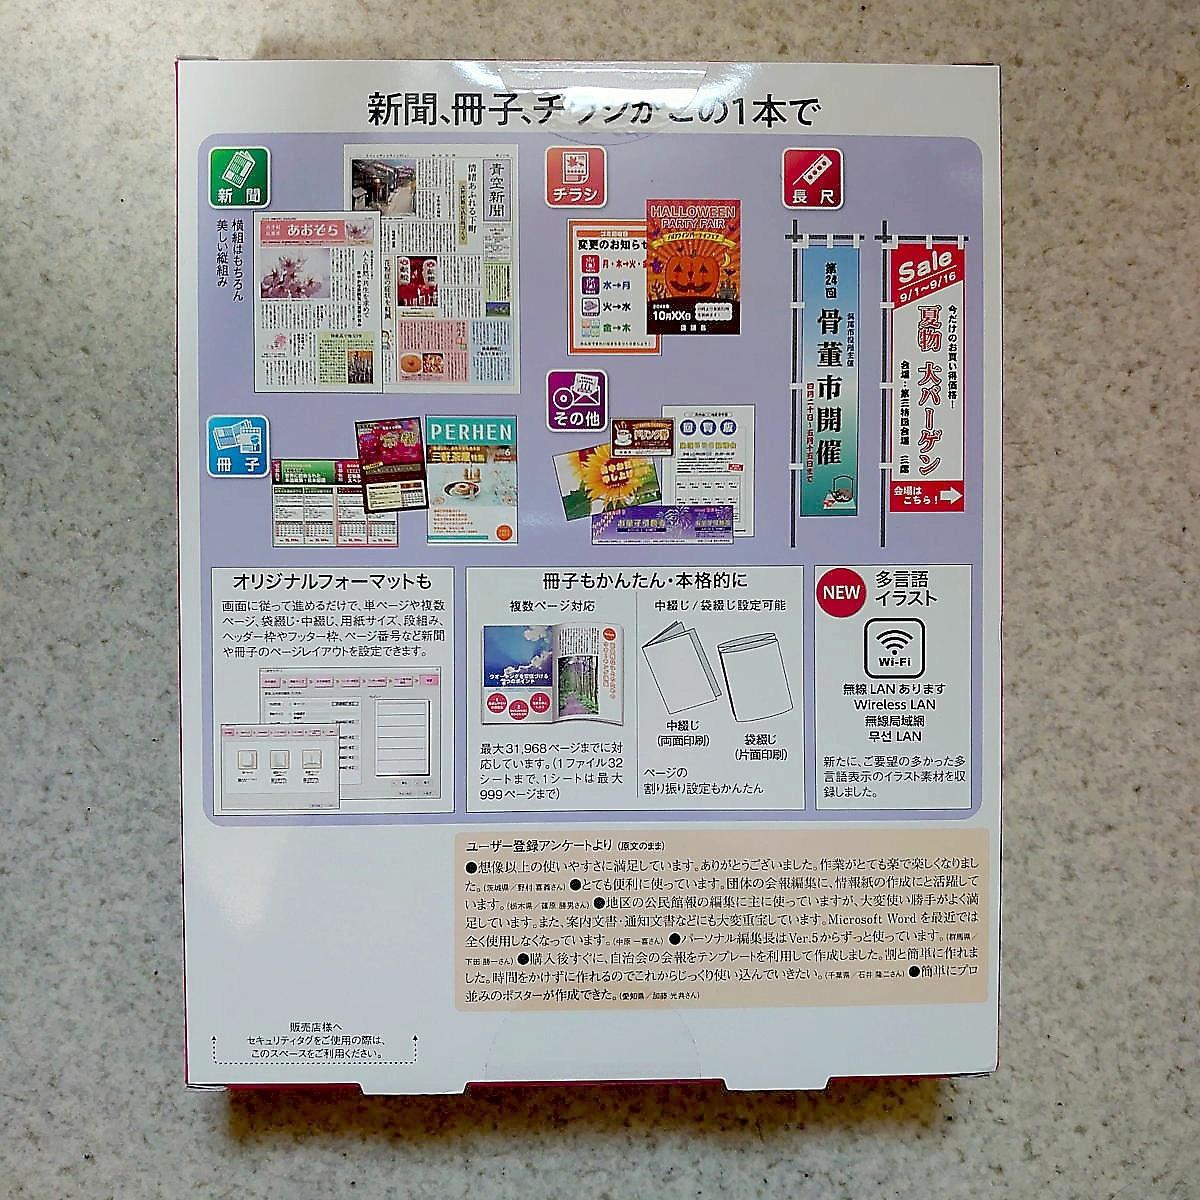 【新品未開封】パーソナル編集長 Ver.14 2020年最新 CD-ROM版_画像3